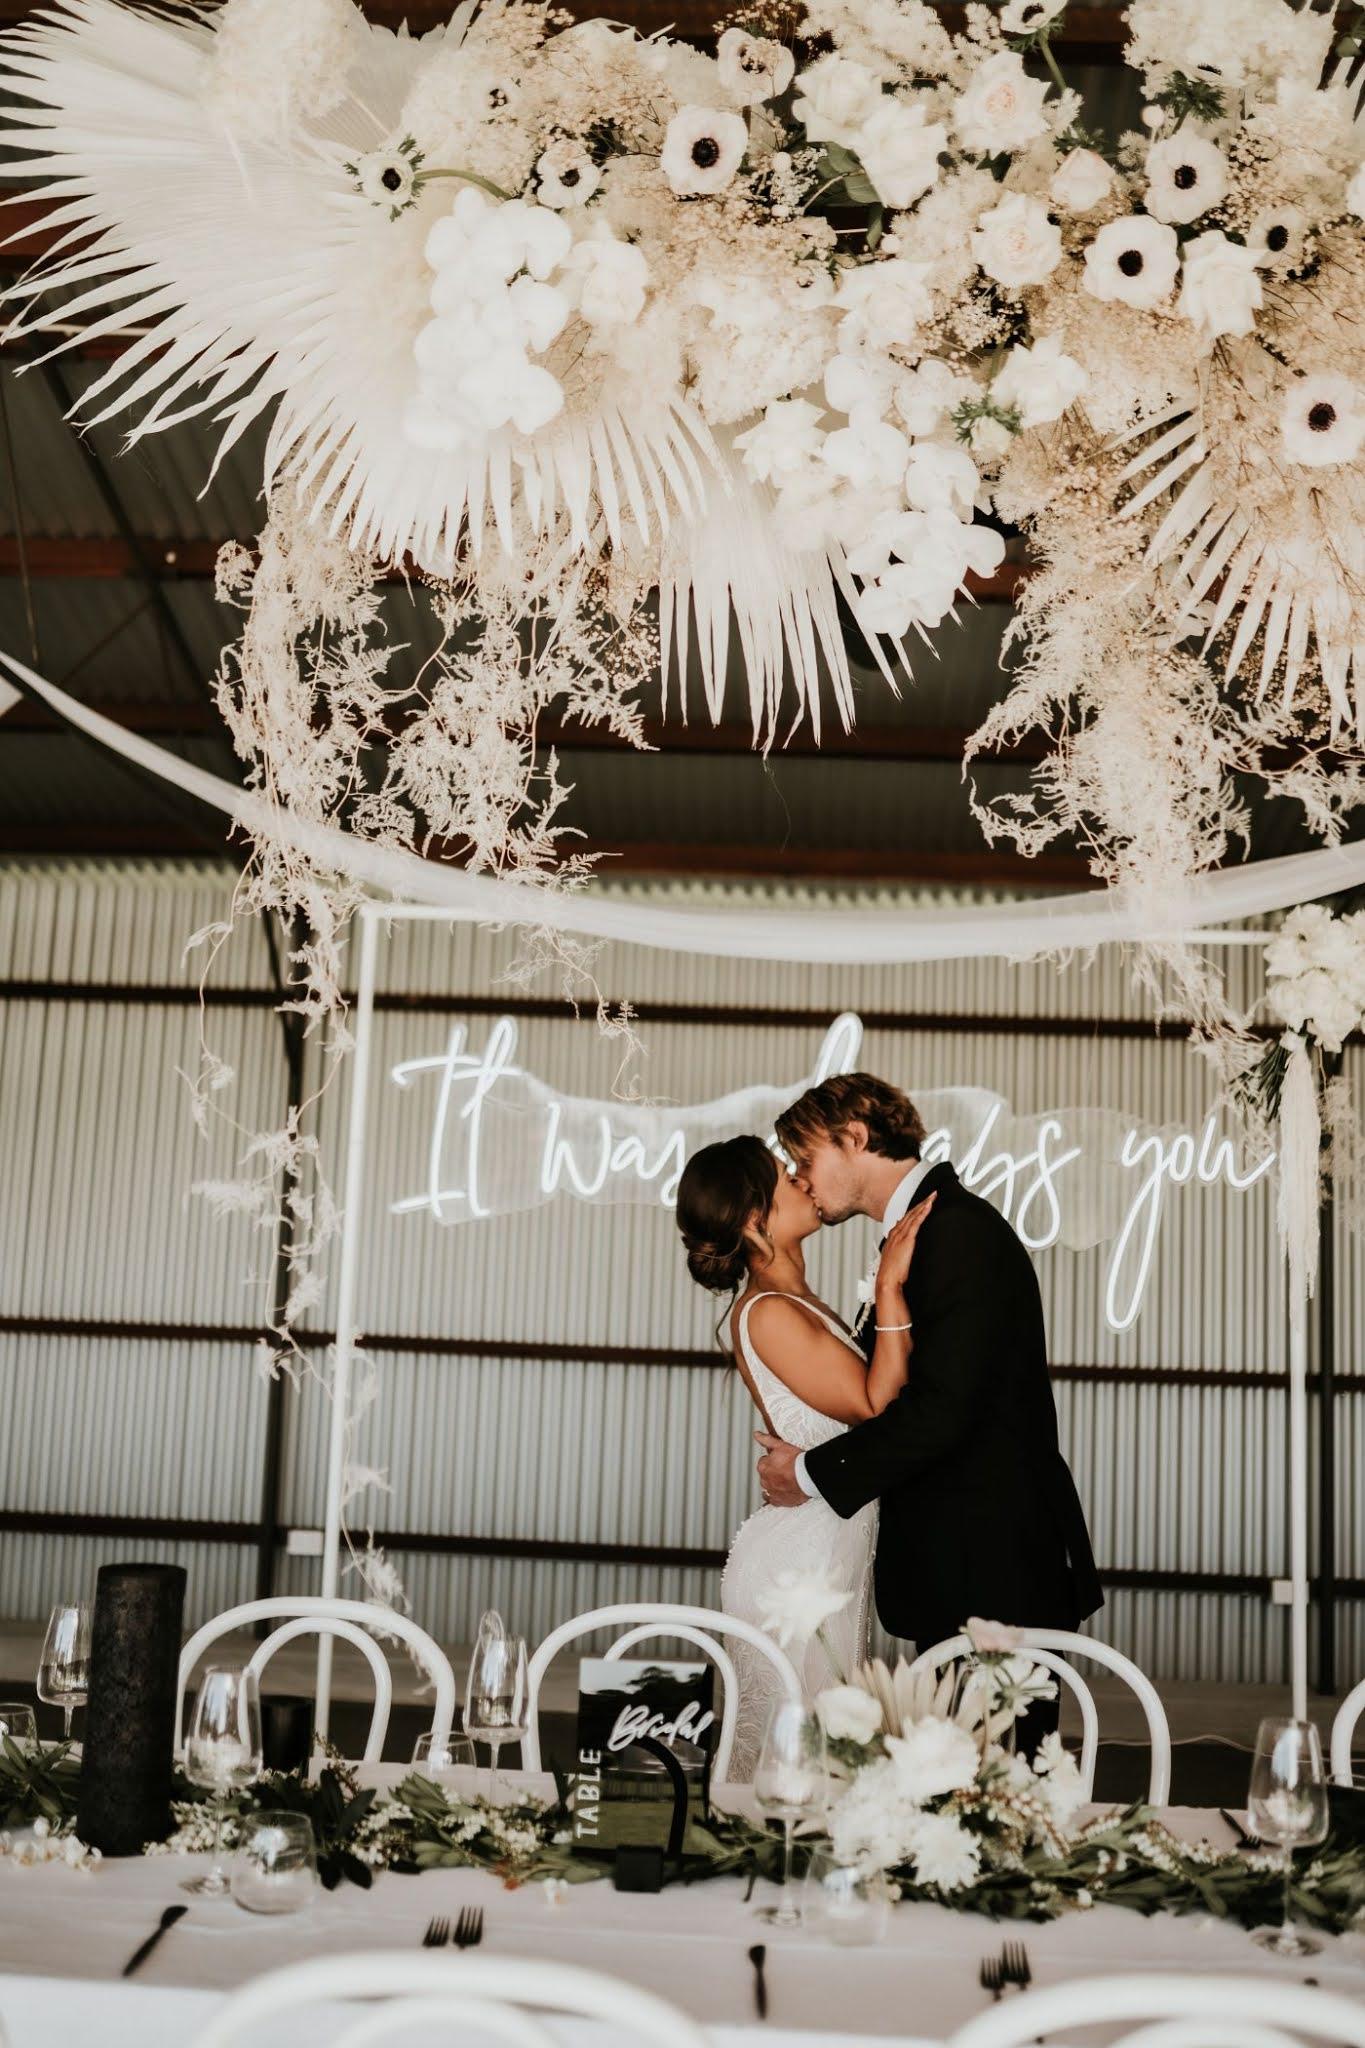 STYLED SHOOT: MARVELLOUS MONOCHROME | STUNNING INTIMATE WEDDING EDITORIAL PEATS RIDGE NSW